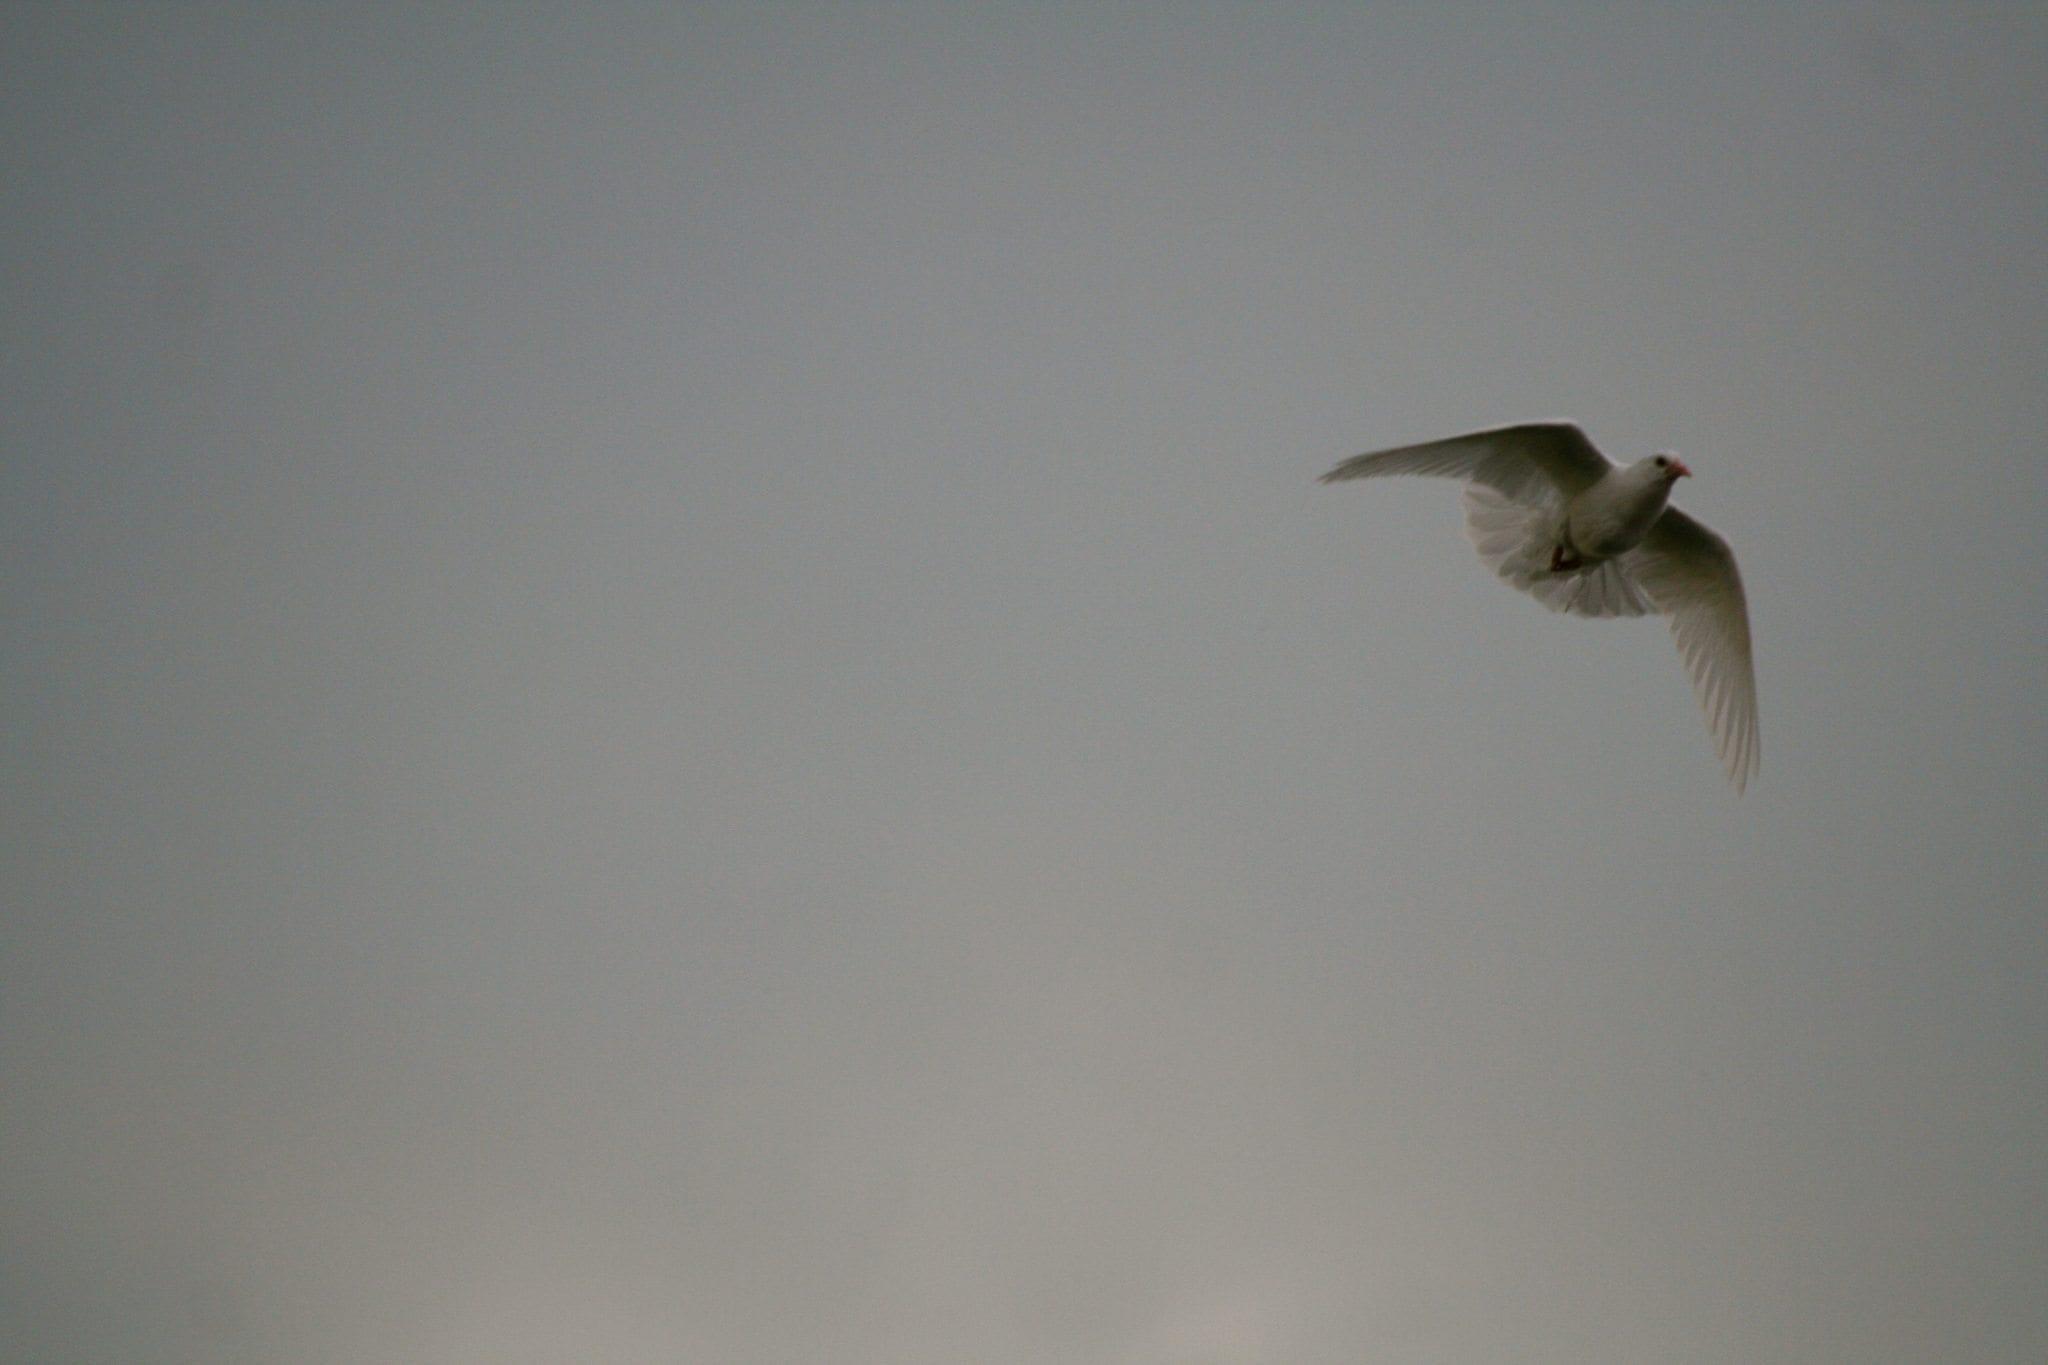 GraceSpace and White Dove